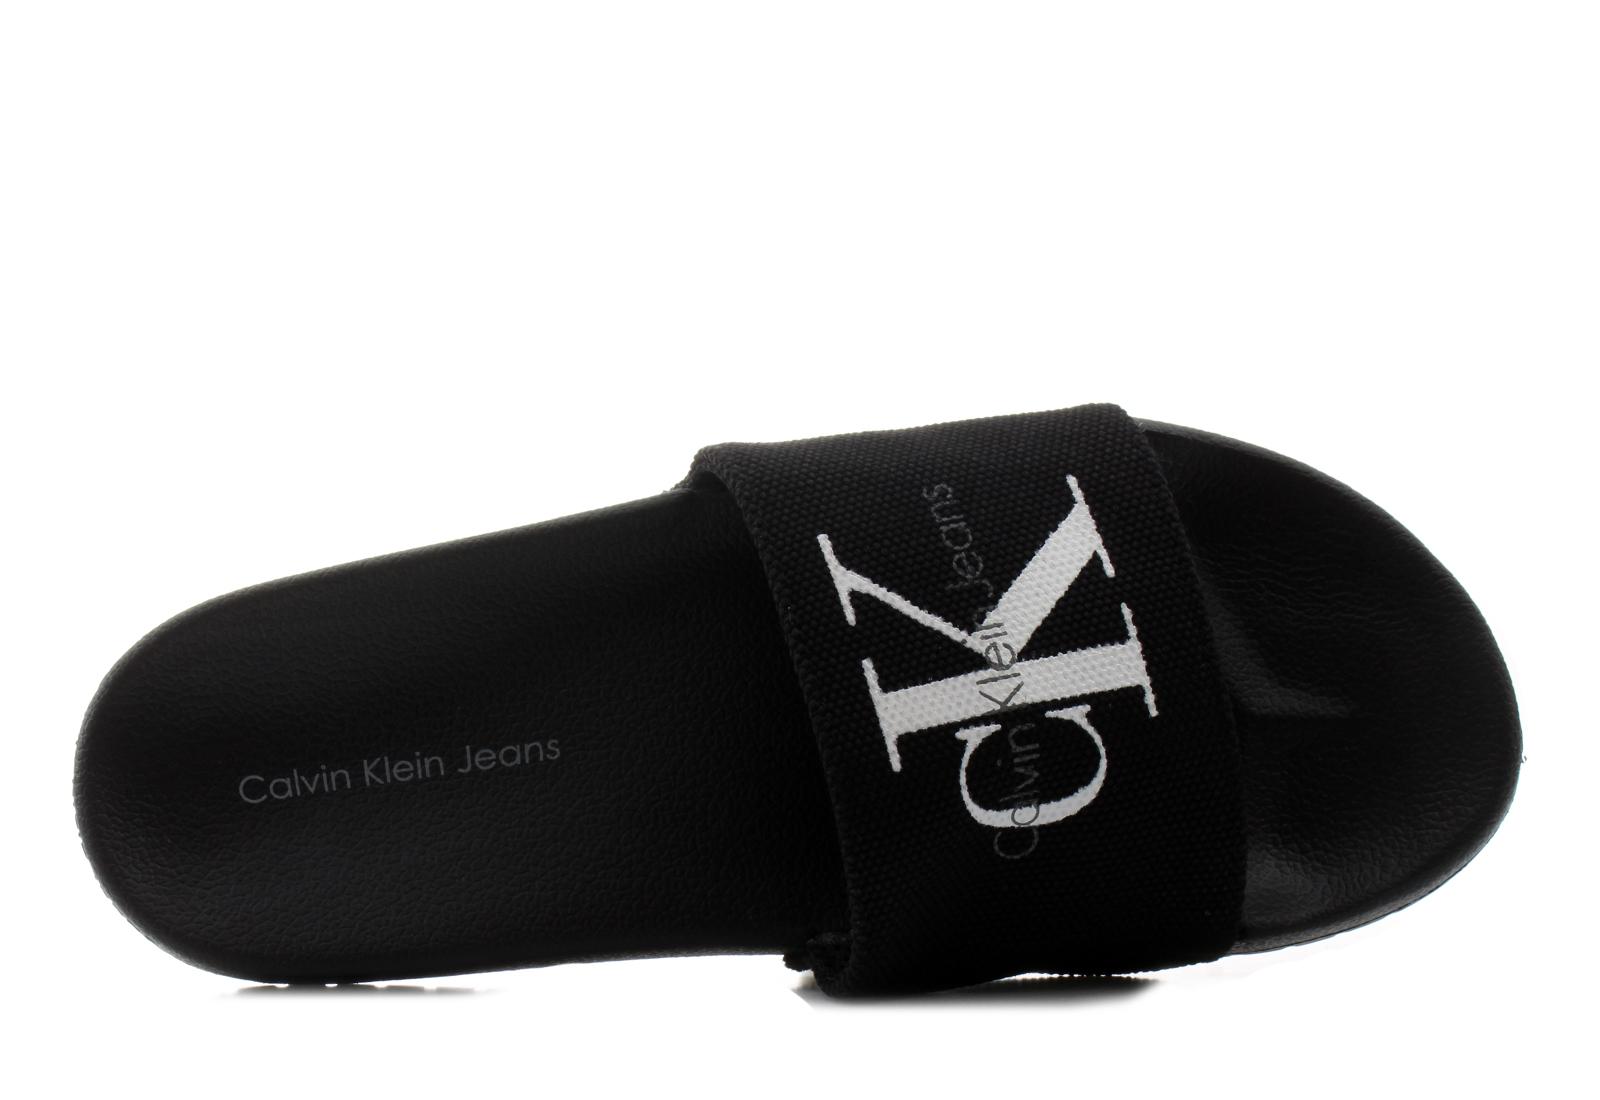 Calvin Klein Jeans Papucs Chantal RE9587 DSK Office